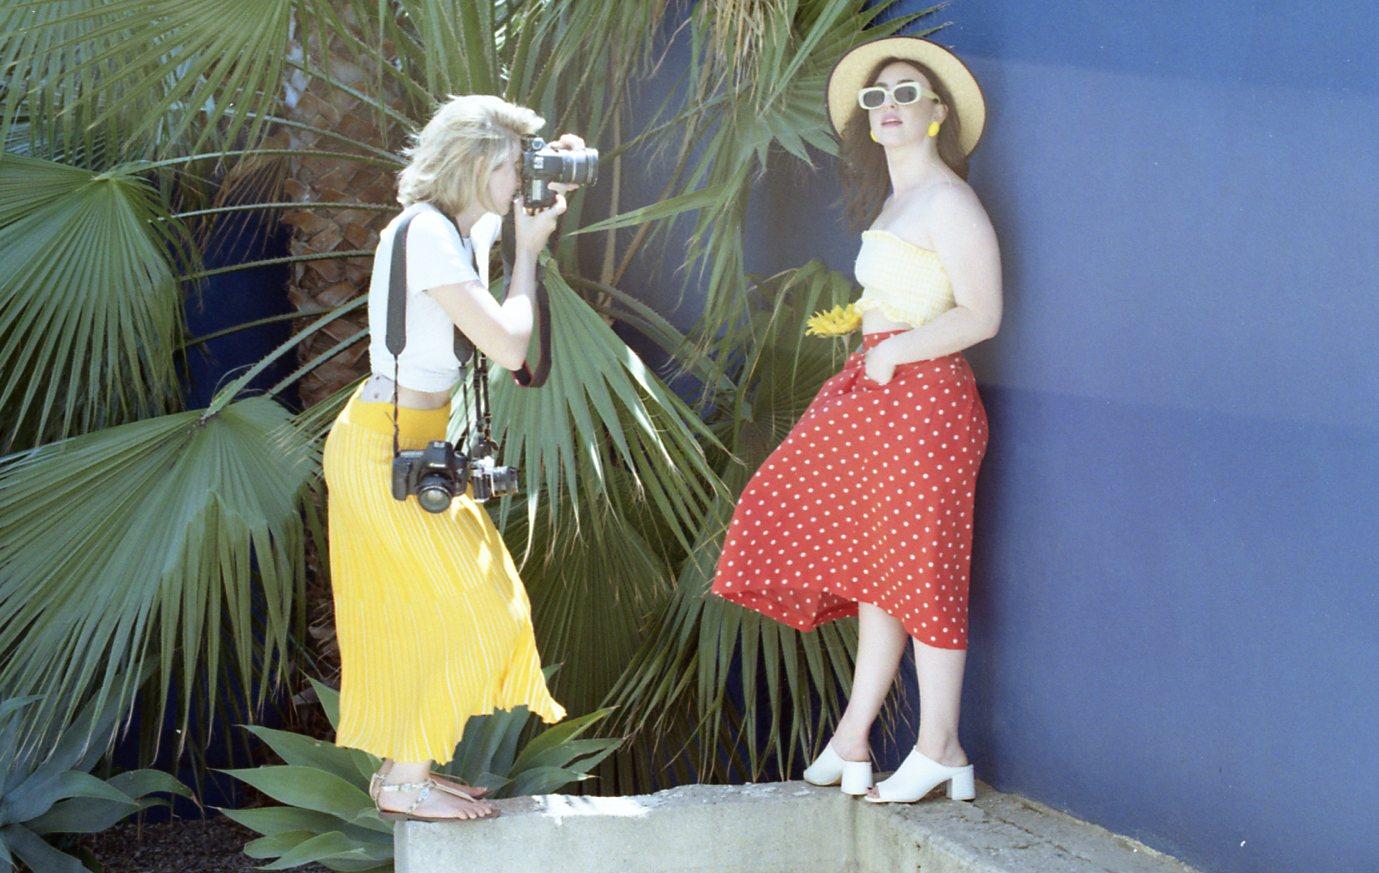 MAGALI GAUTHIER - Behind the Scenes&Stills Photographer